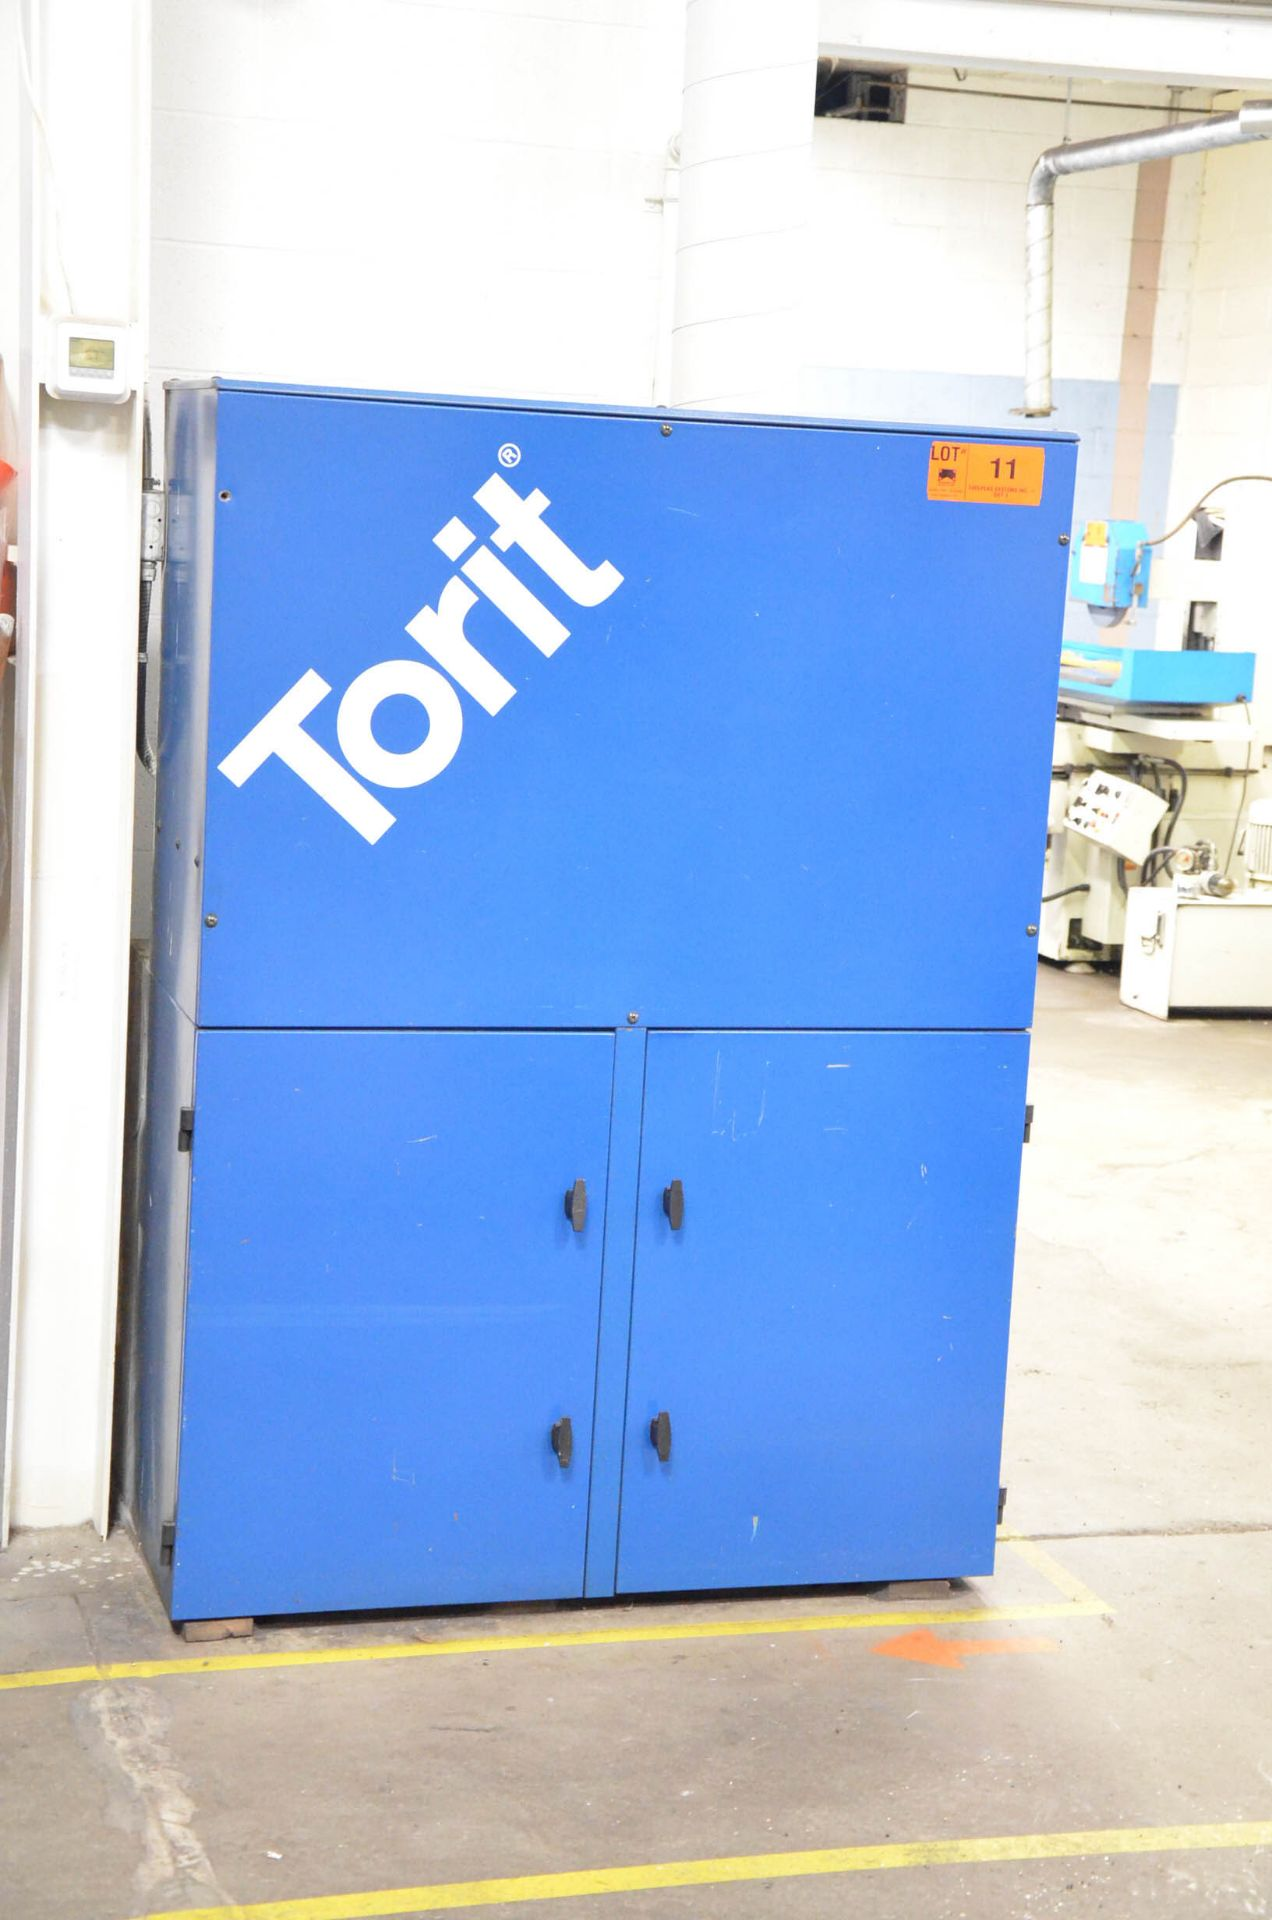 DONALDSON TORIT VS2400 5HP FLOOR-TYPE DUST COLLECTOR, 575V/3PH/60HZ, S/N: IG524206 (CI) [RIGGING - Image 2 of 3